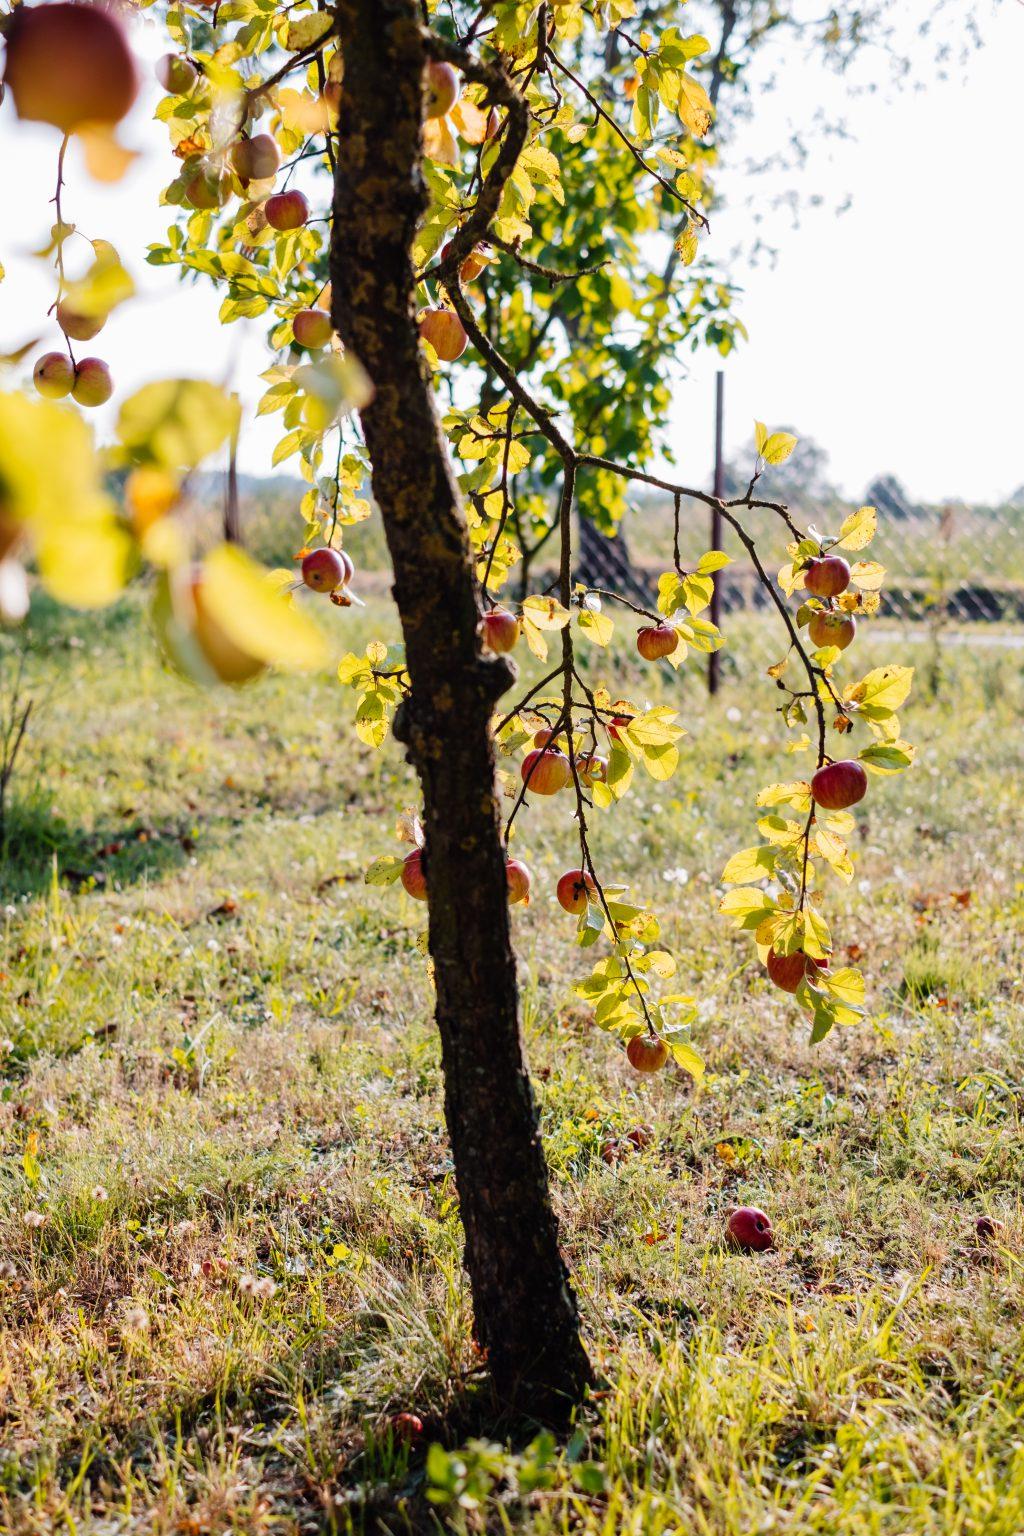 Apple tree 2 - free stock photo